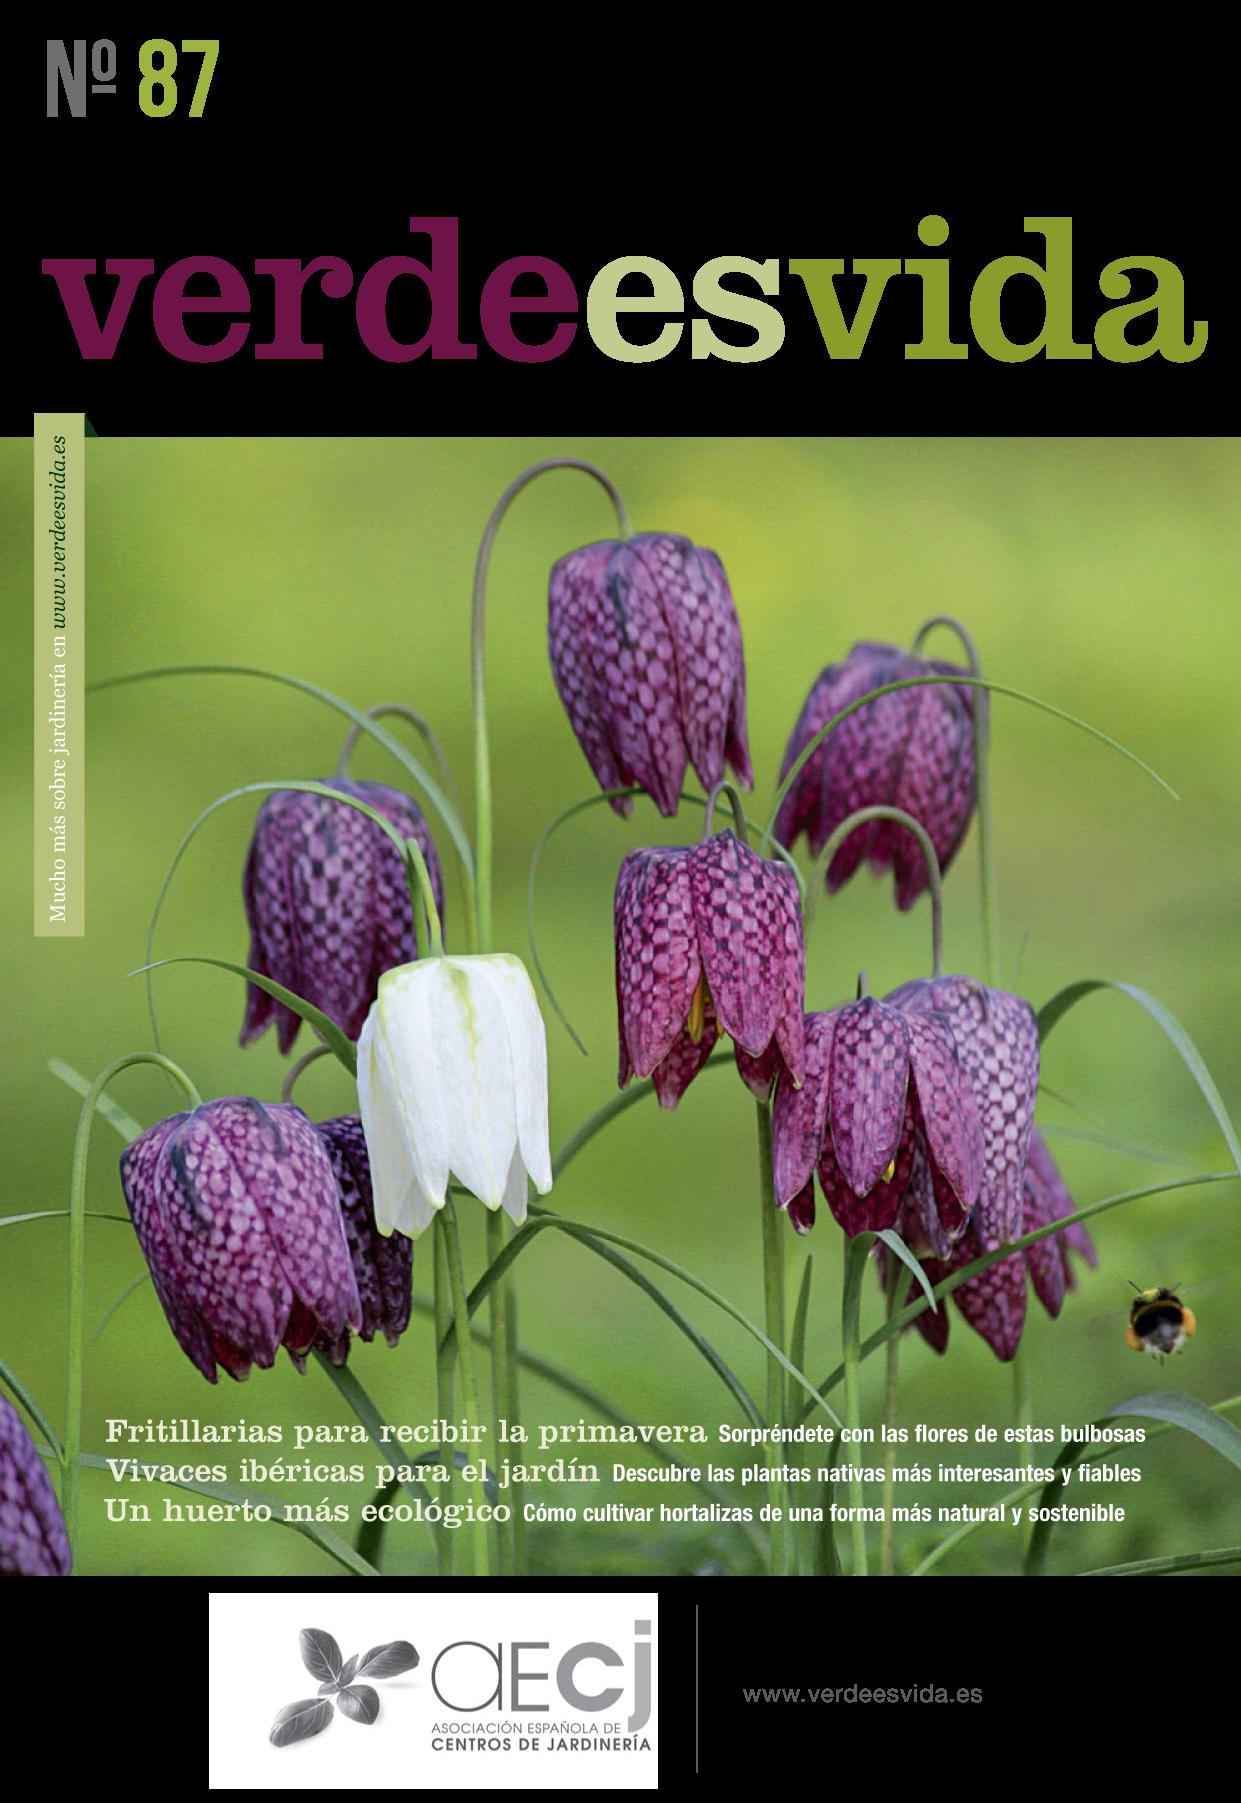 Revista verdeesvida nº 87